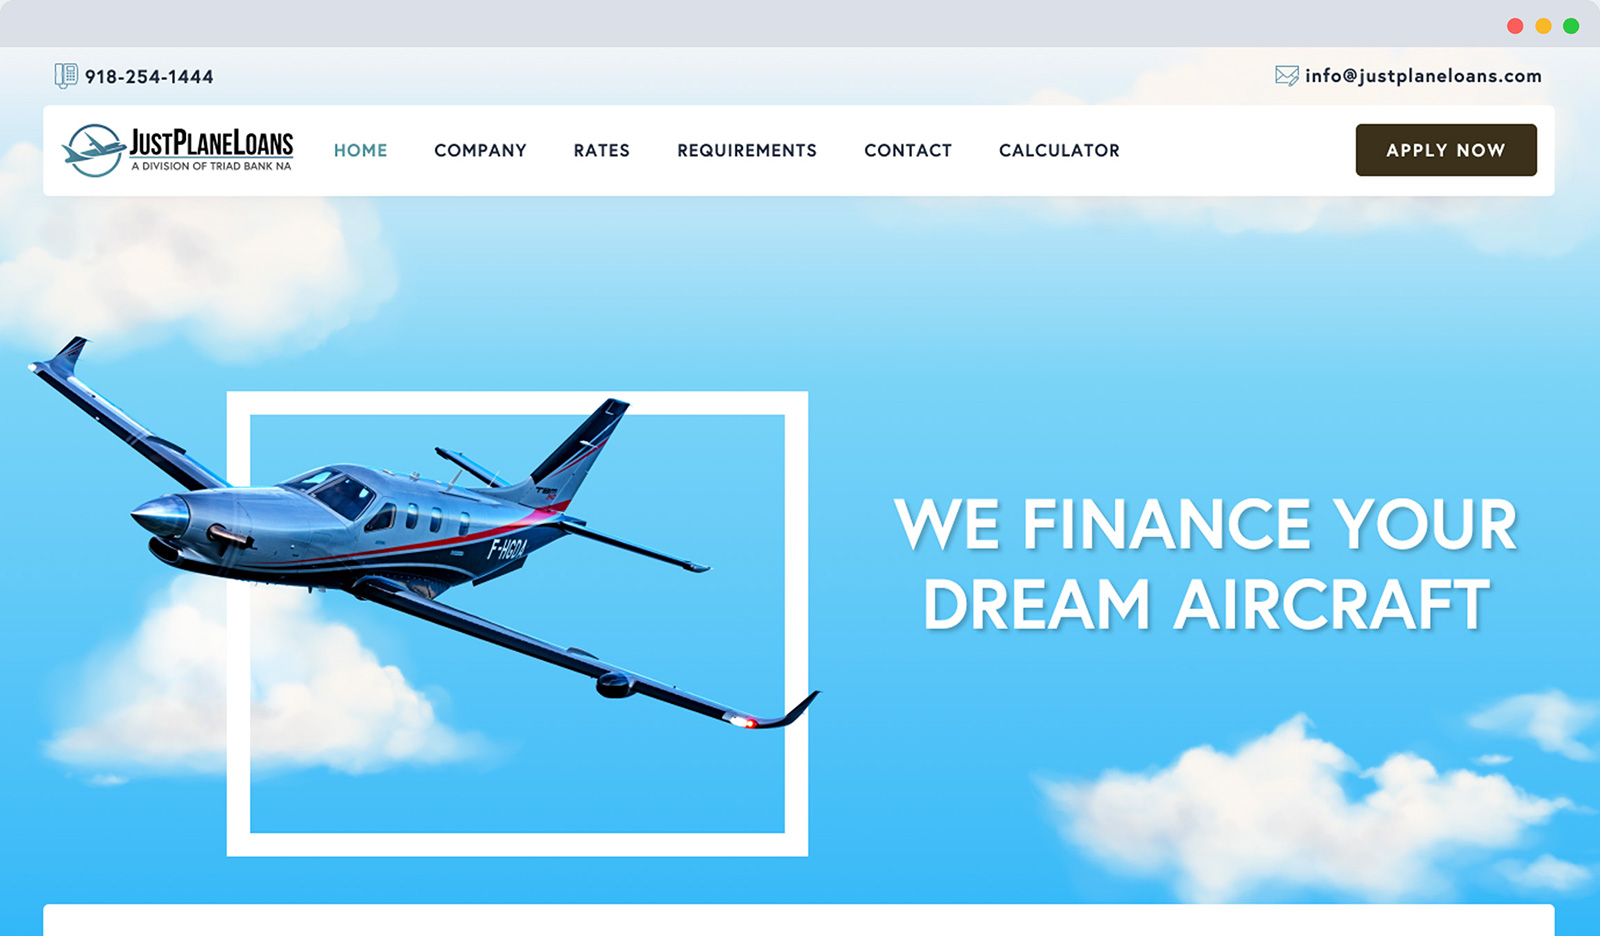 Just Plane Loans